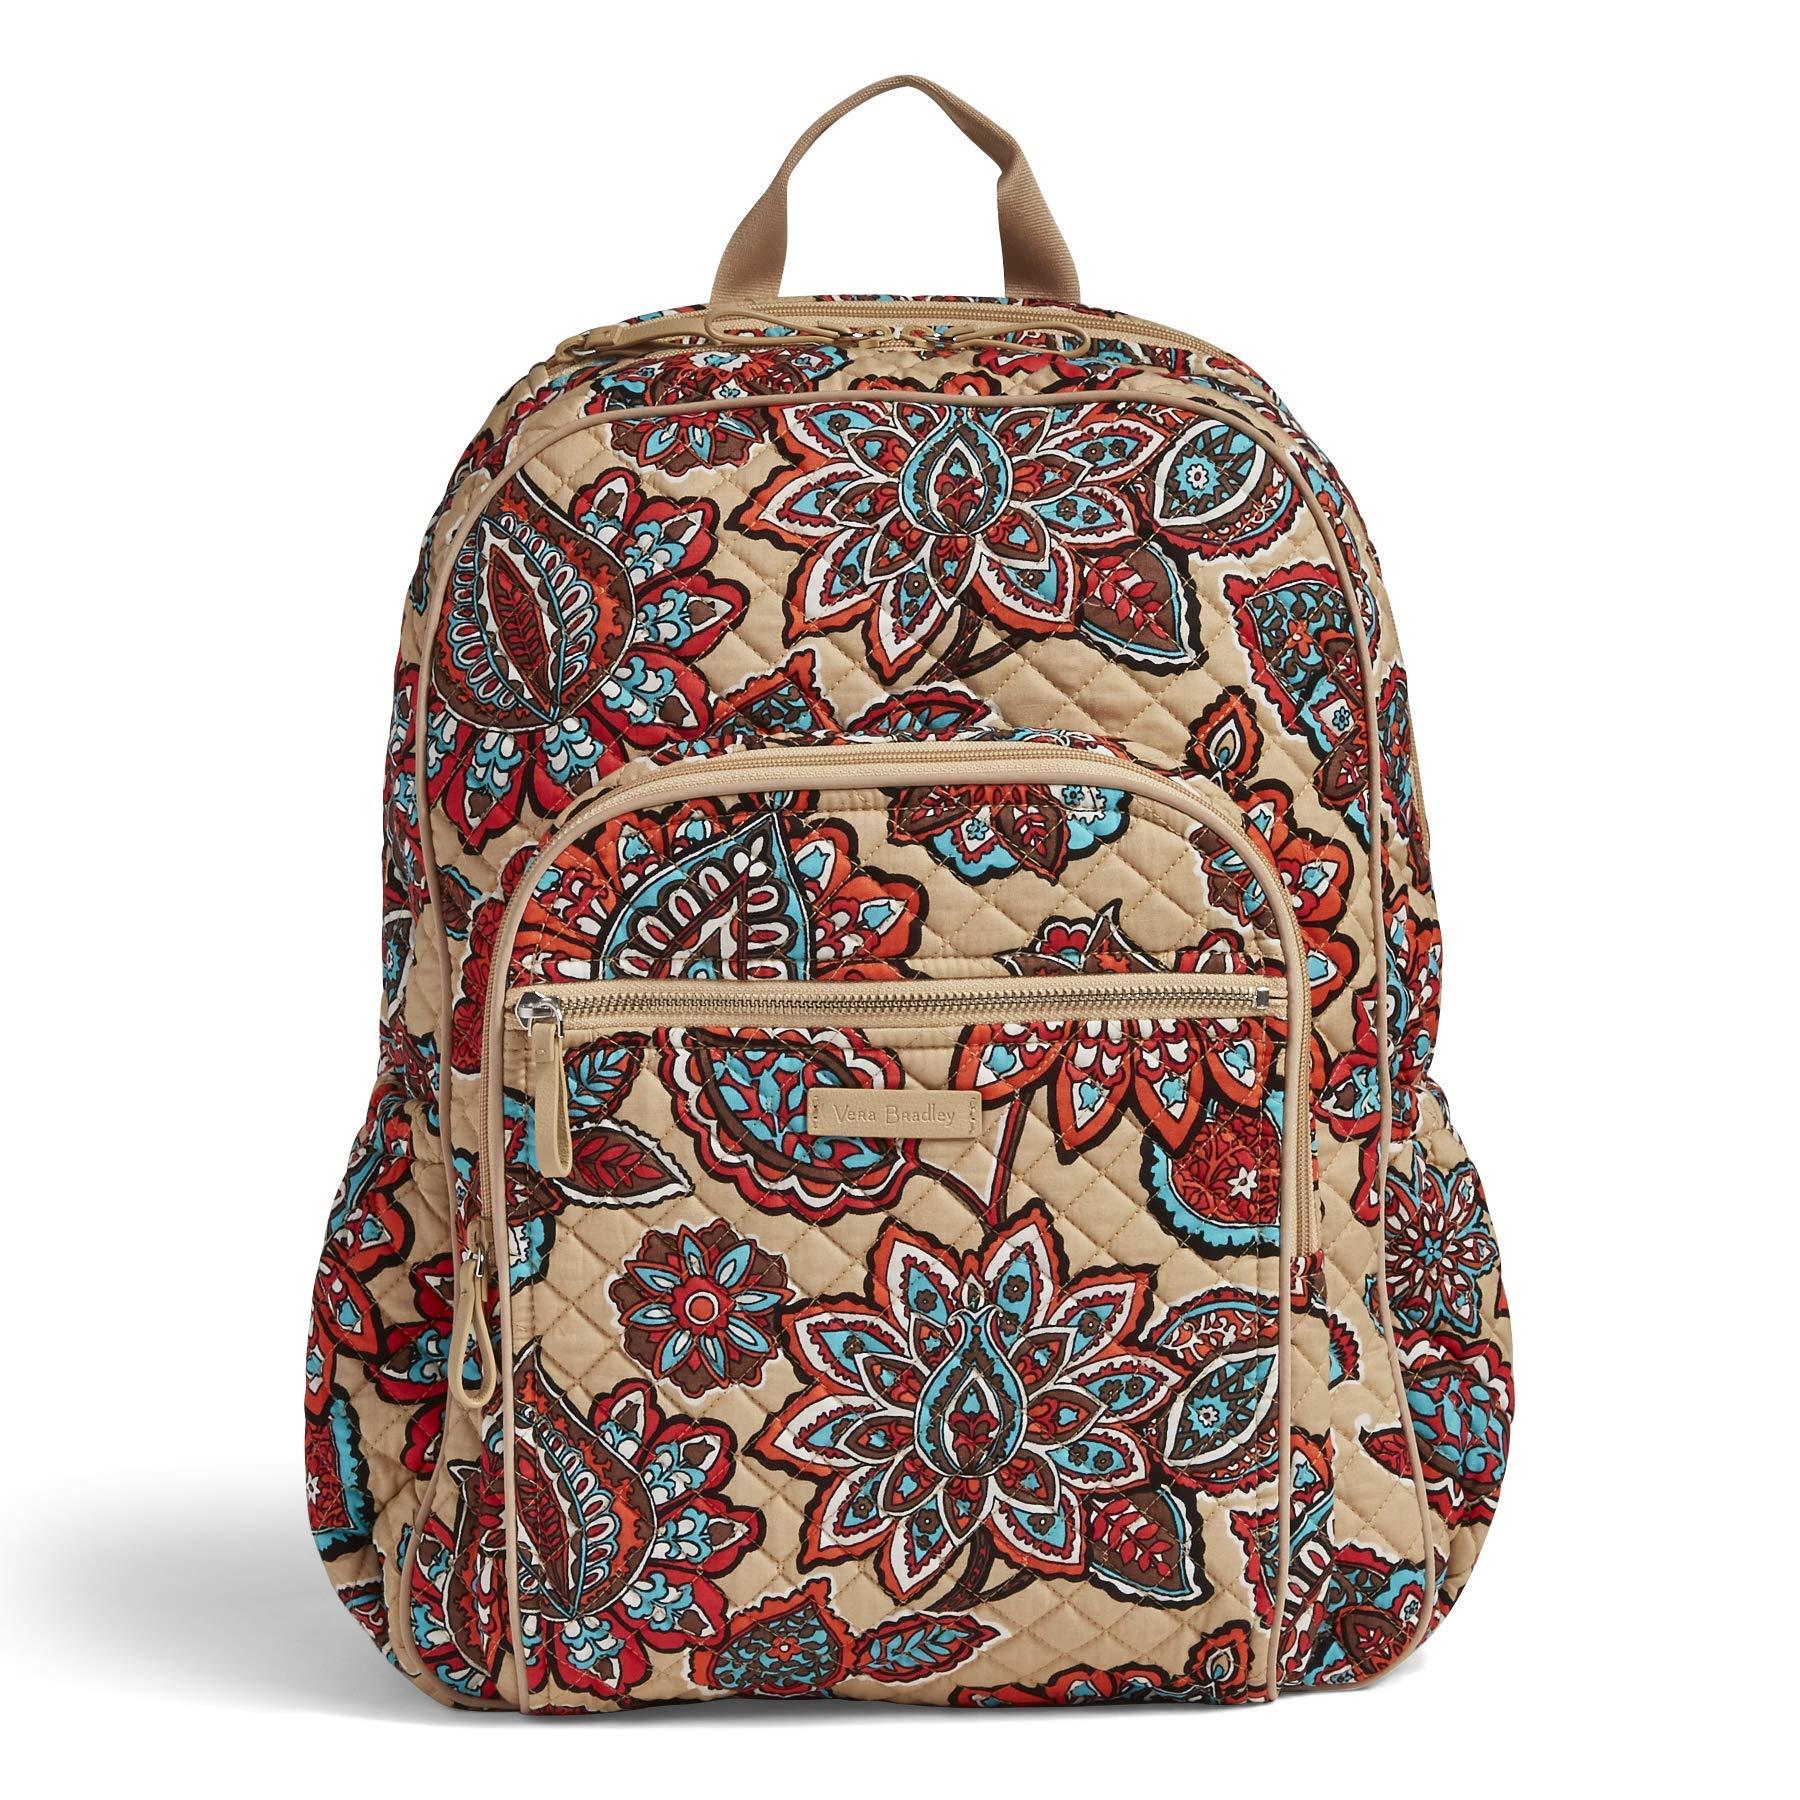 Vera Bradley Iconic Campus Backpack, Signature Cotton, Desert Floral + 1.50 Power